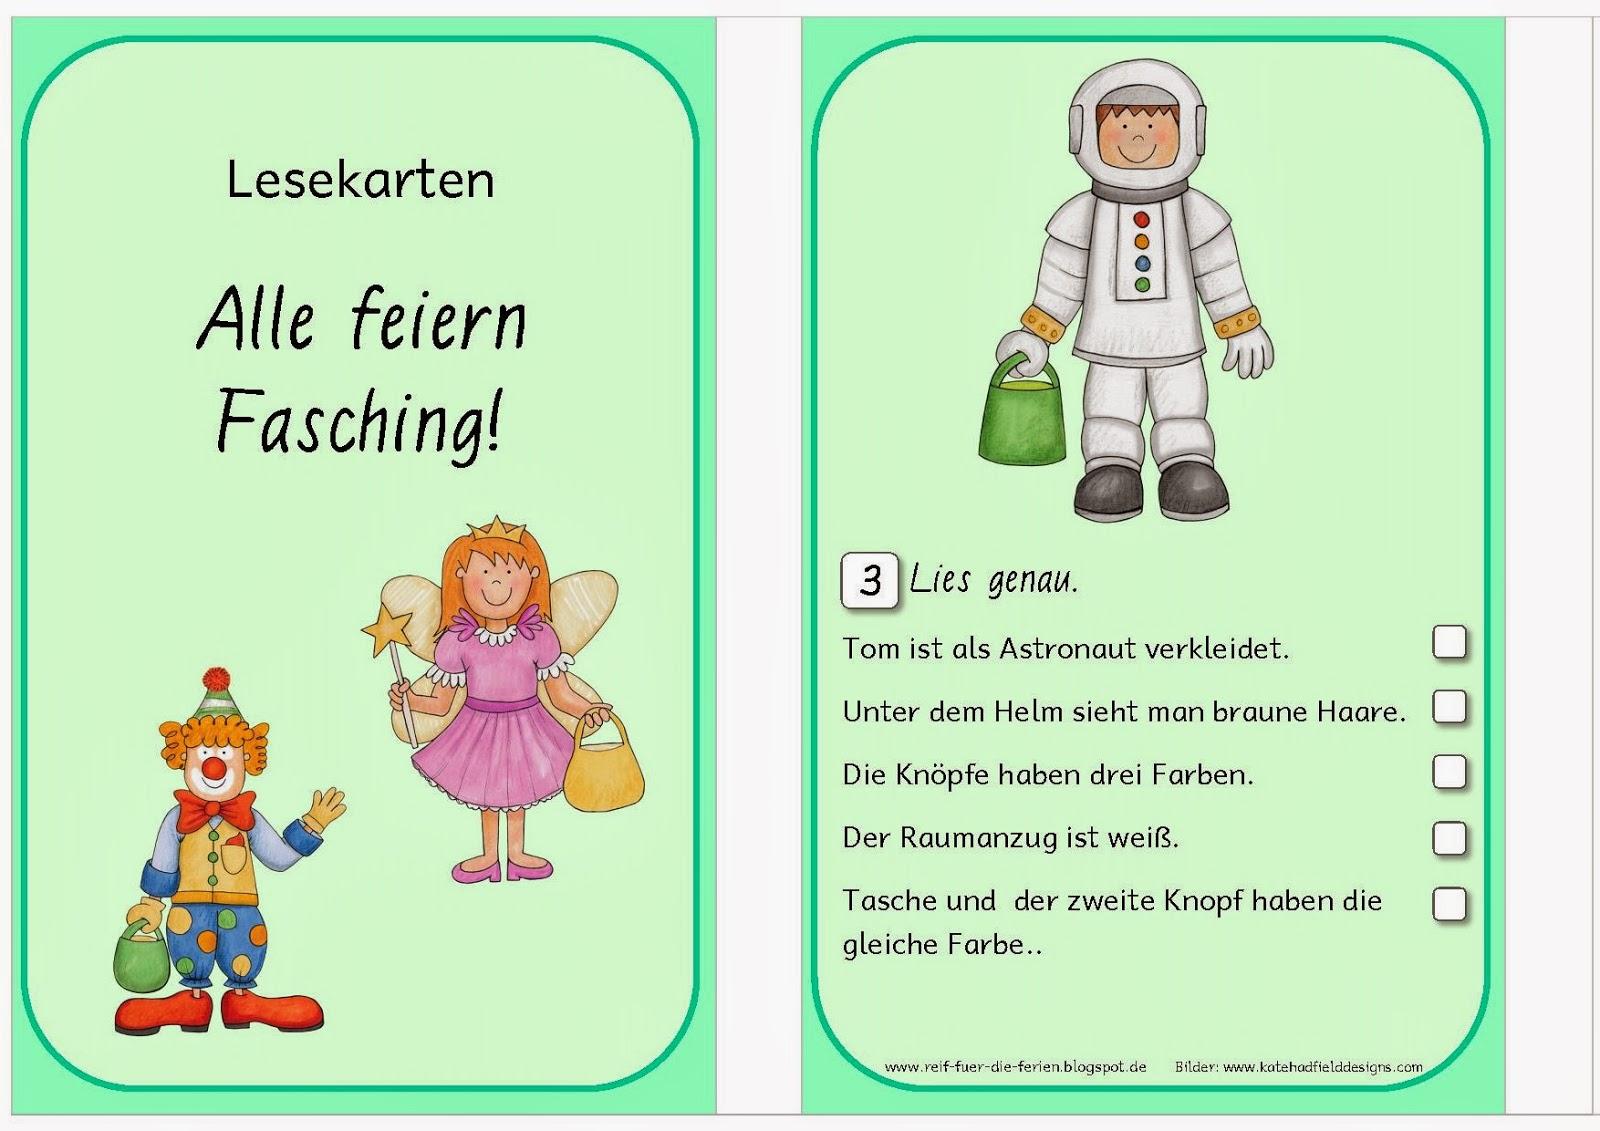 Faschings - Lesekarten